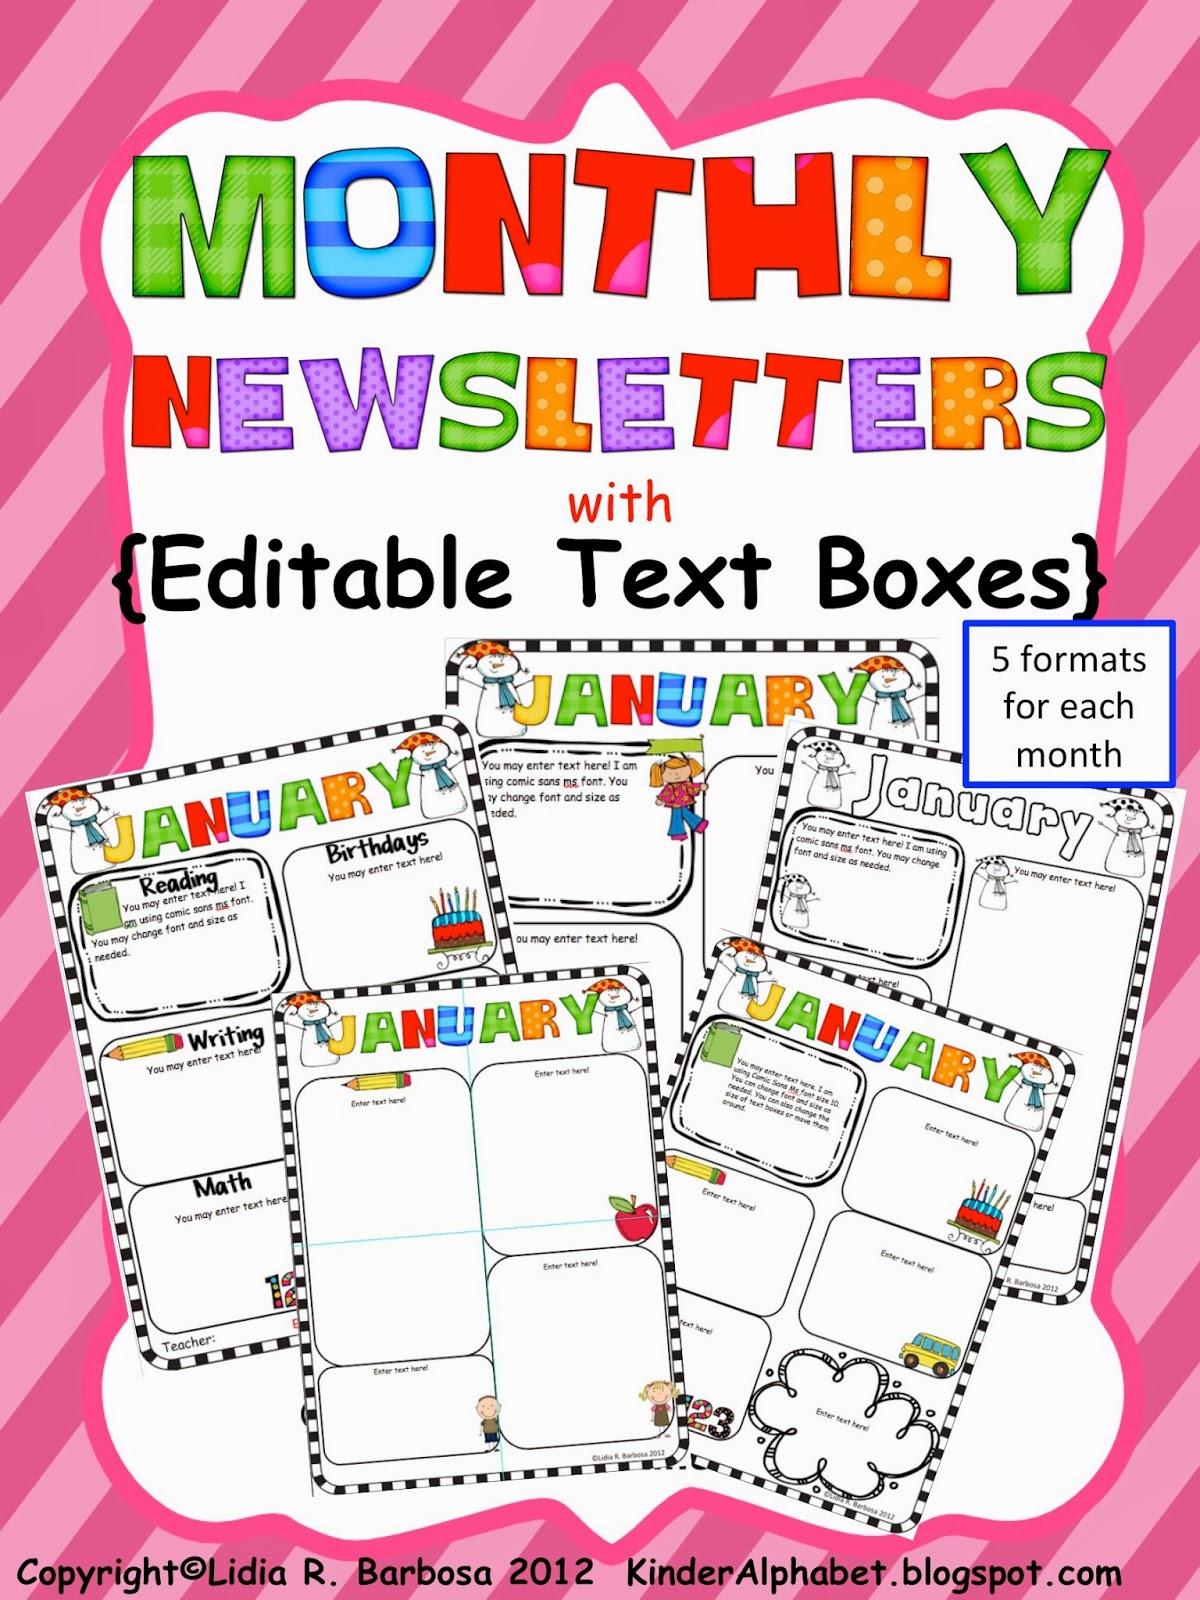 Kindergarten newsletter clipart vector transparent Kindergarten newsletter clipart - ClipartFest vector transparent